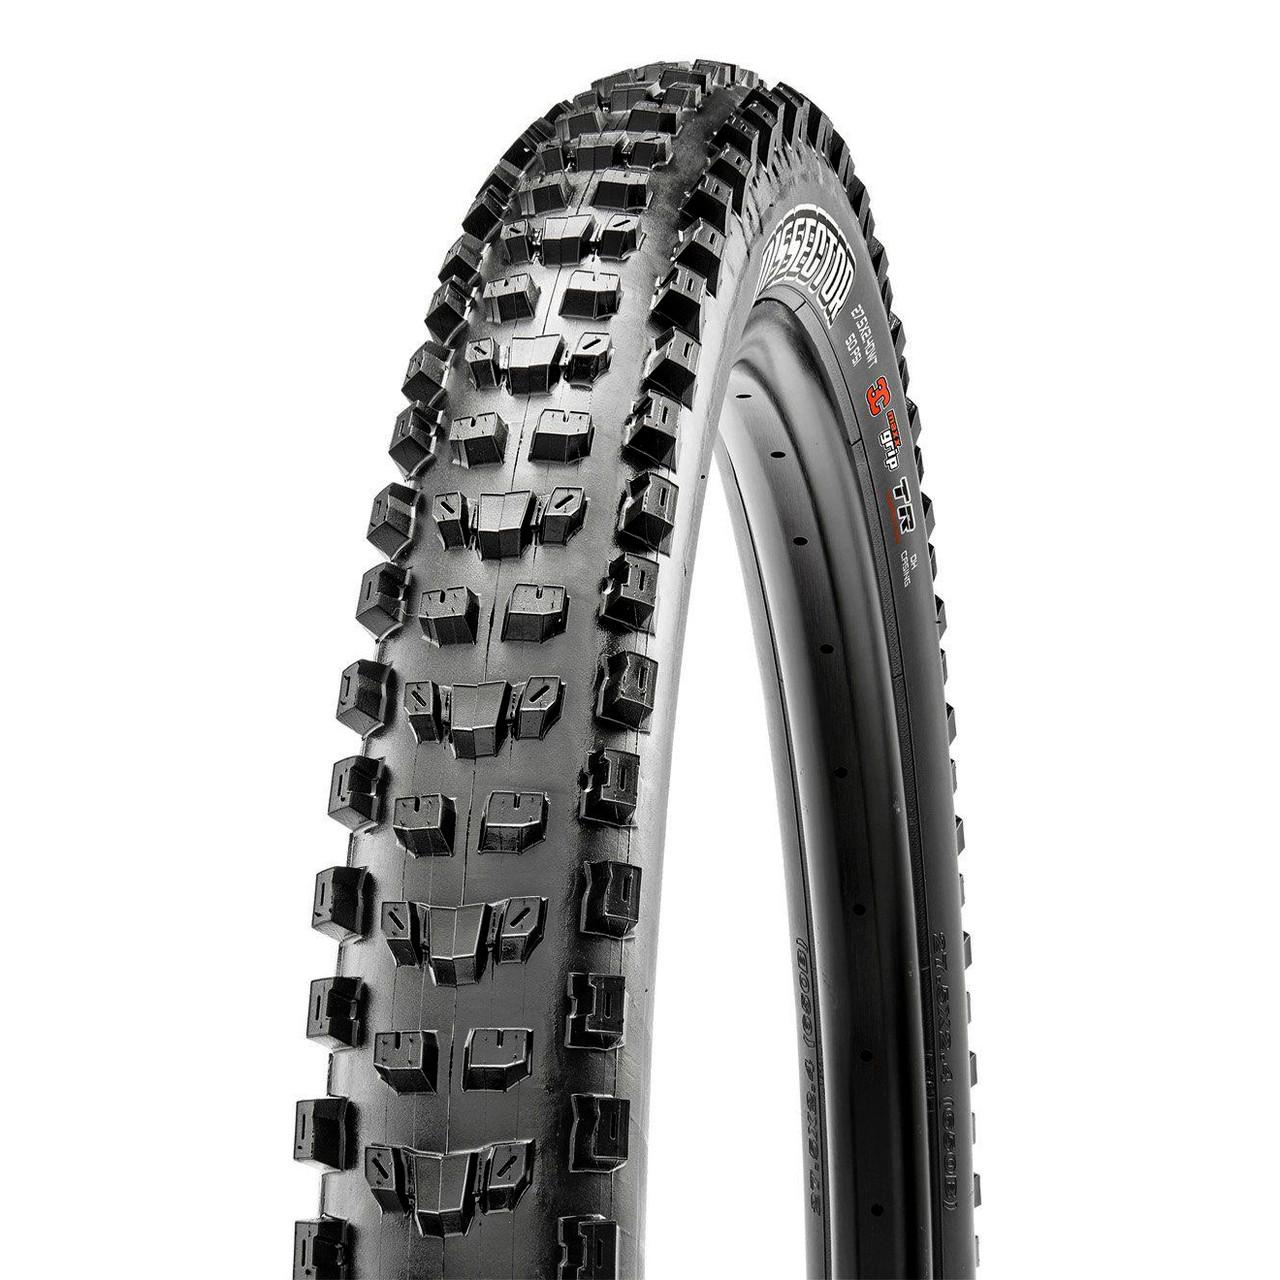 "Покришка велосипедна Maxxis Dissector 29x2.4"" WT (складна, фолдінга) 3С/EXO/TR (Tubeless Ready)"